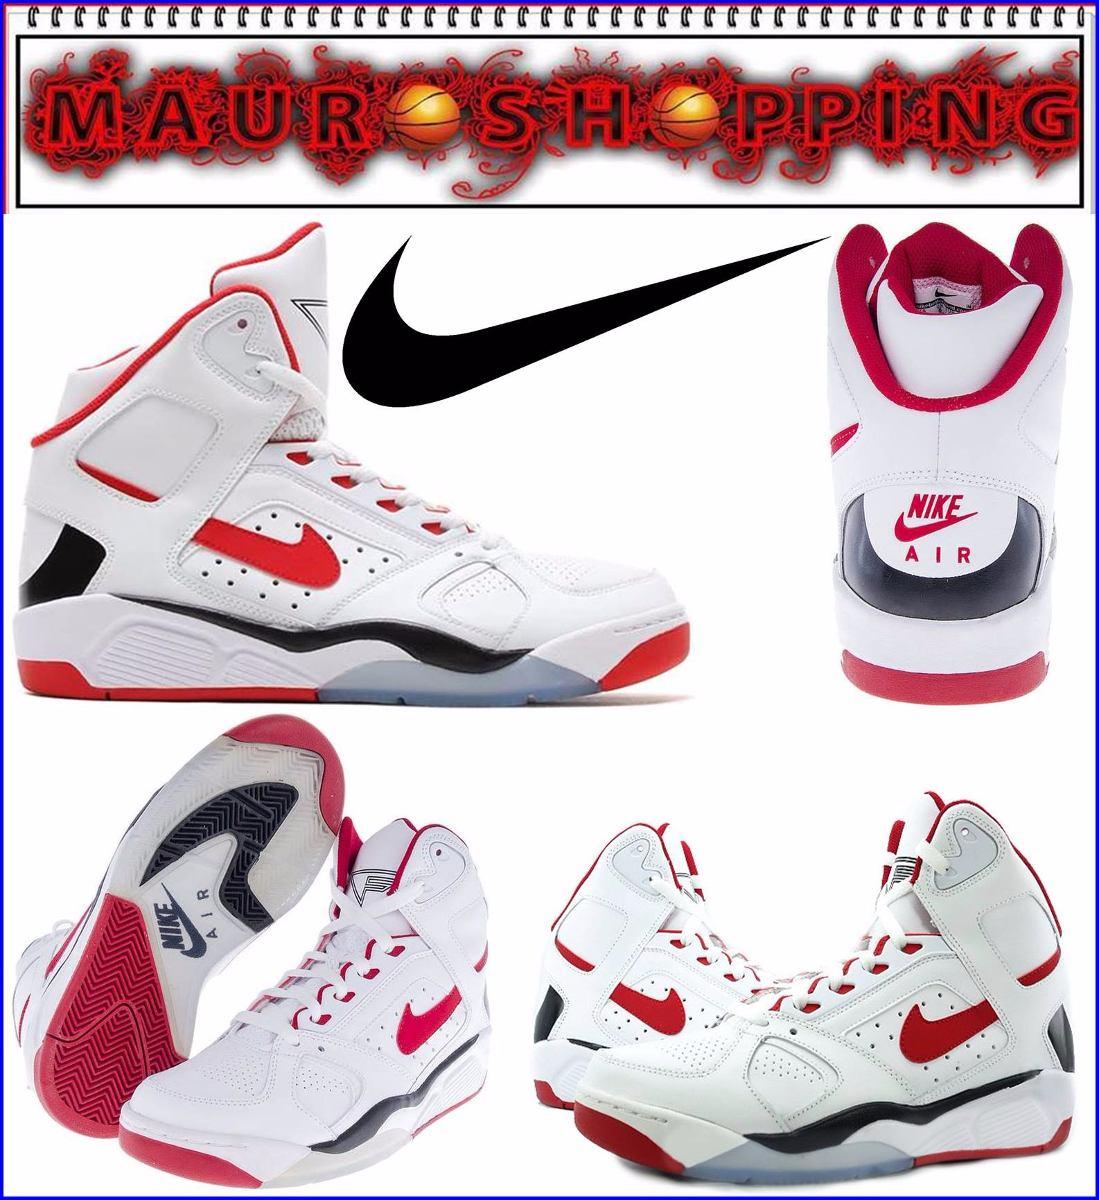 2680ba058f7 Tenis nike air flight jordan originales cero replicas jpg 1099x1200 Replicas  imagenes de zapatos jordan